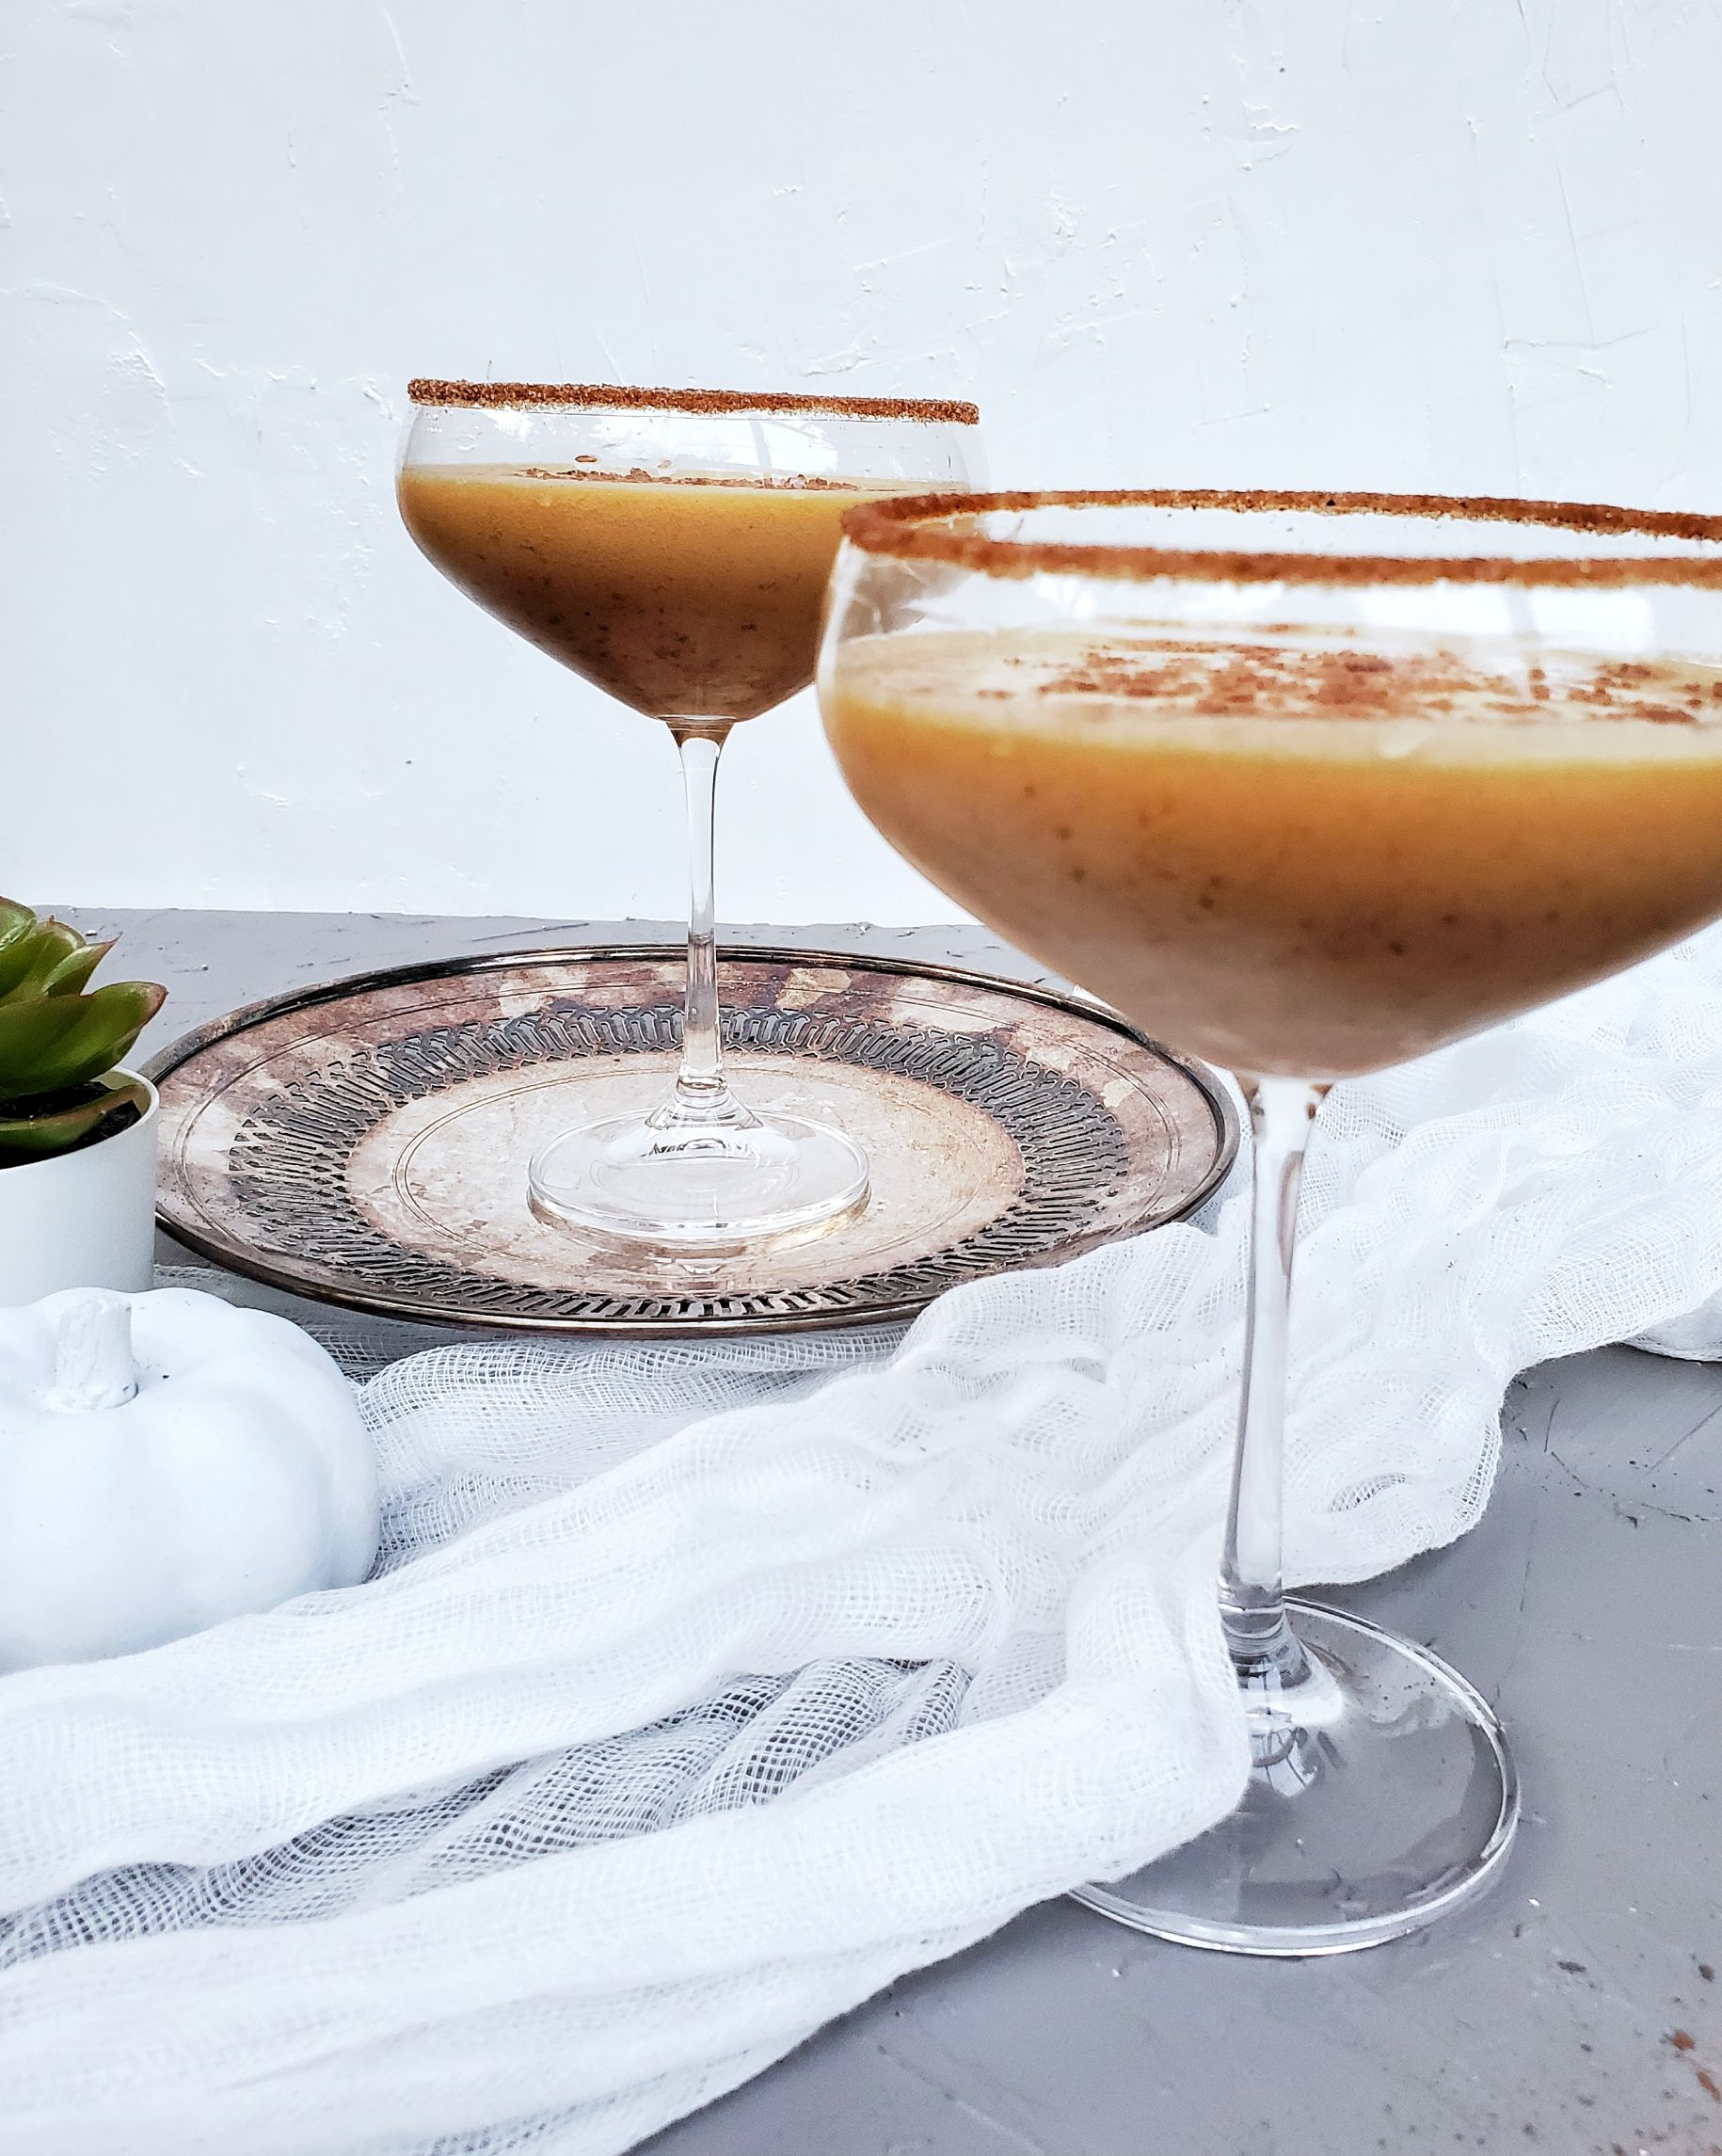 pumpkin brandy alexander cocktails side view